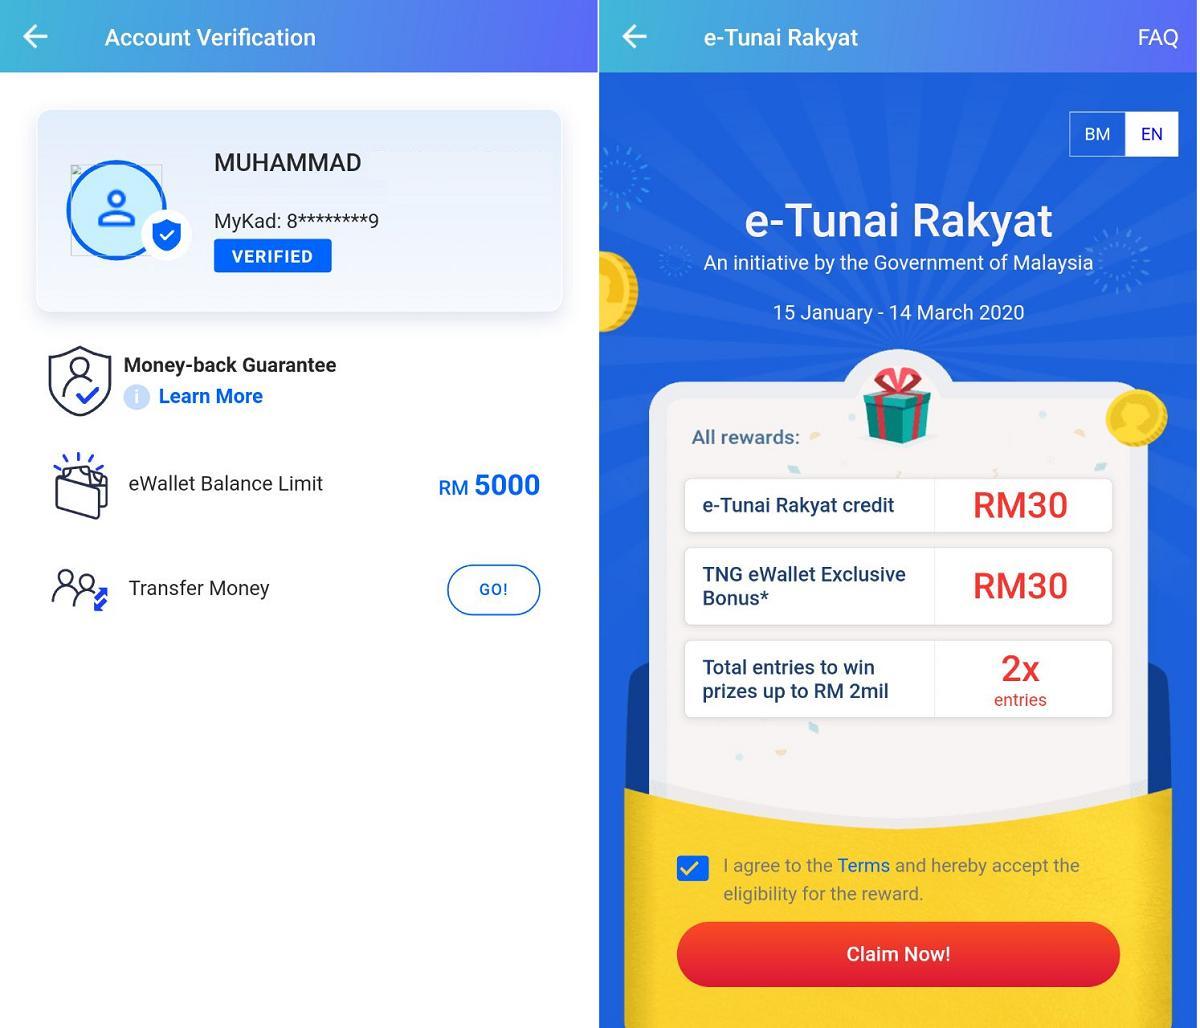 claim rm30 e-tunai rakyat tng ewallet